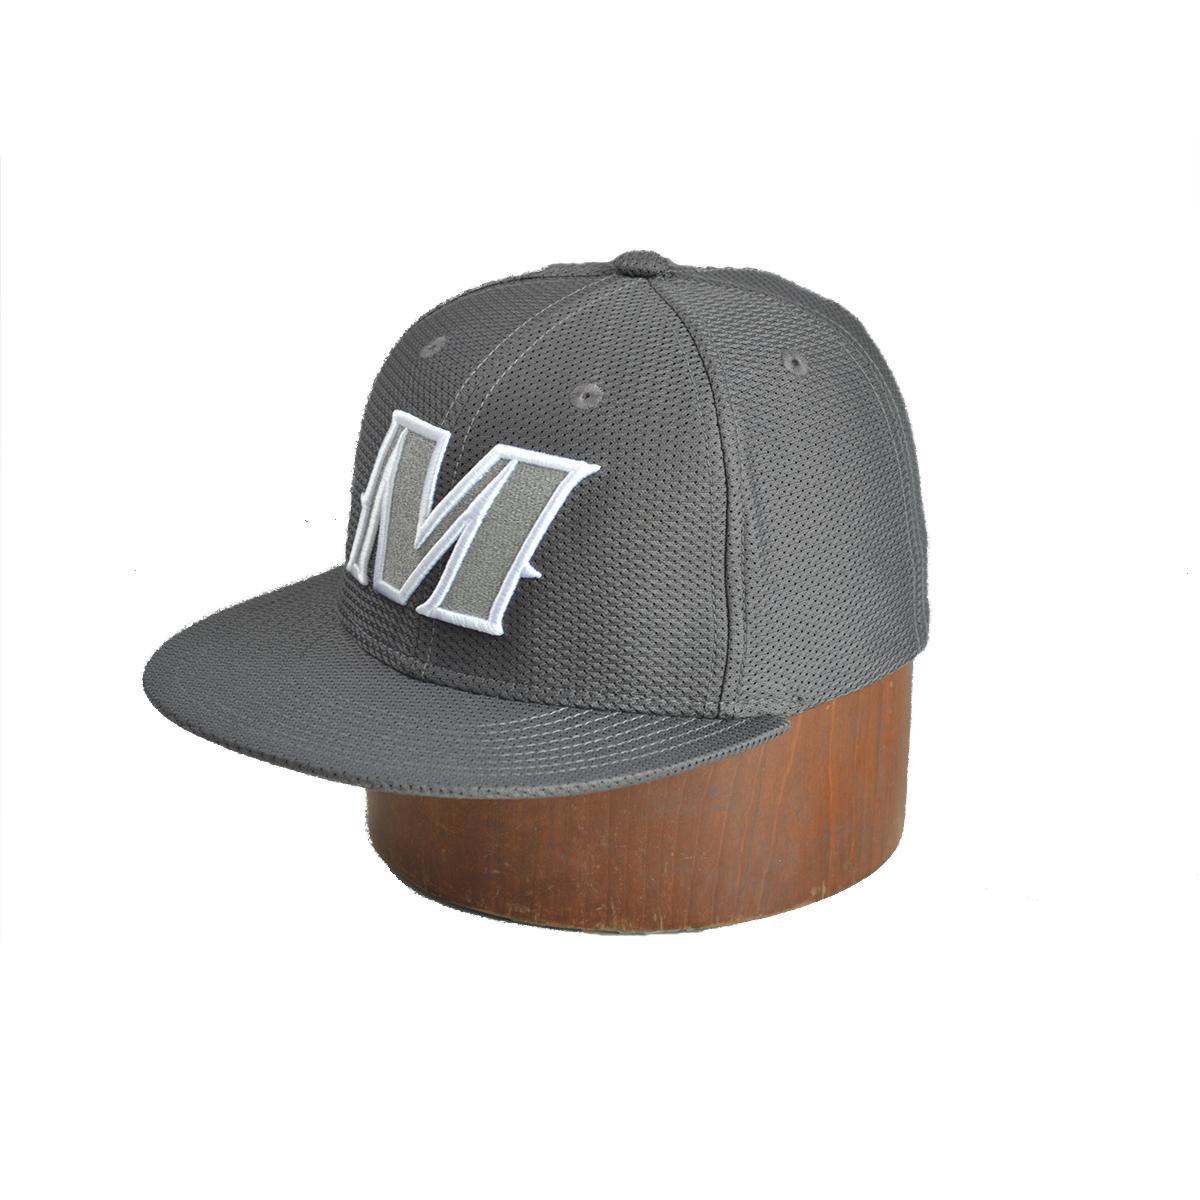 Flexifit Baseball Cap 3D Embroidery